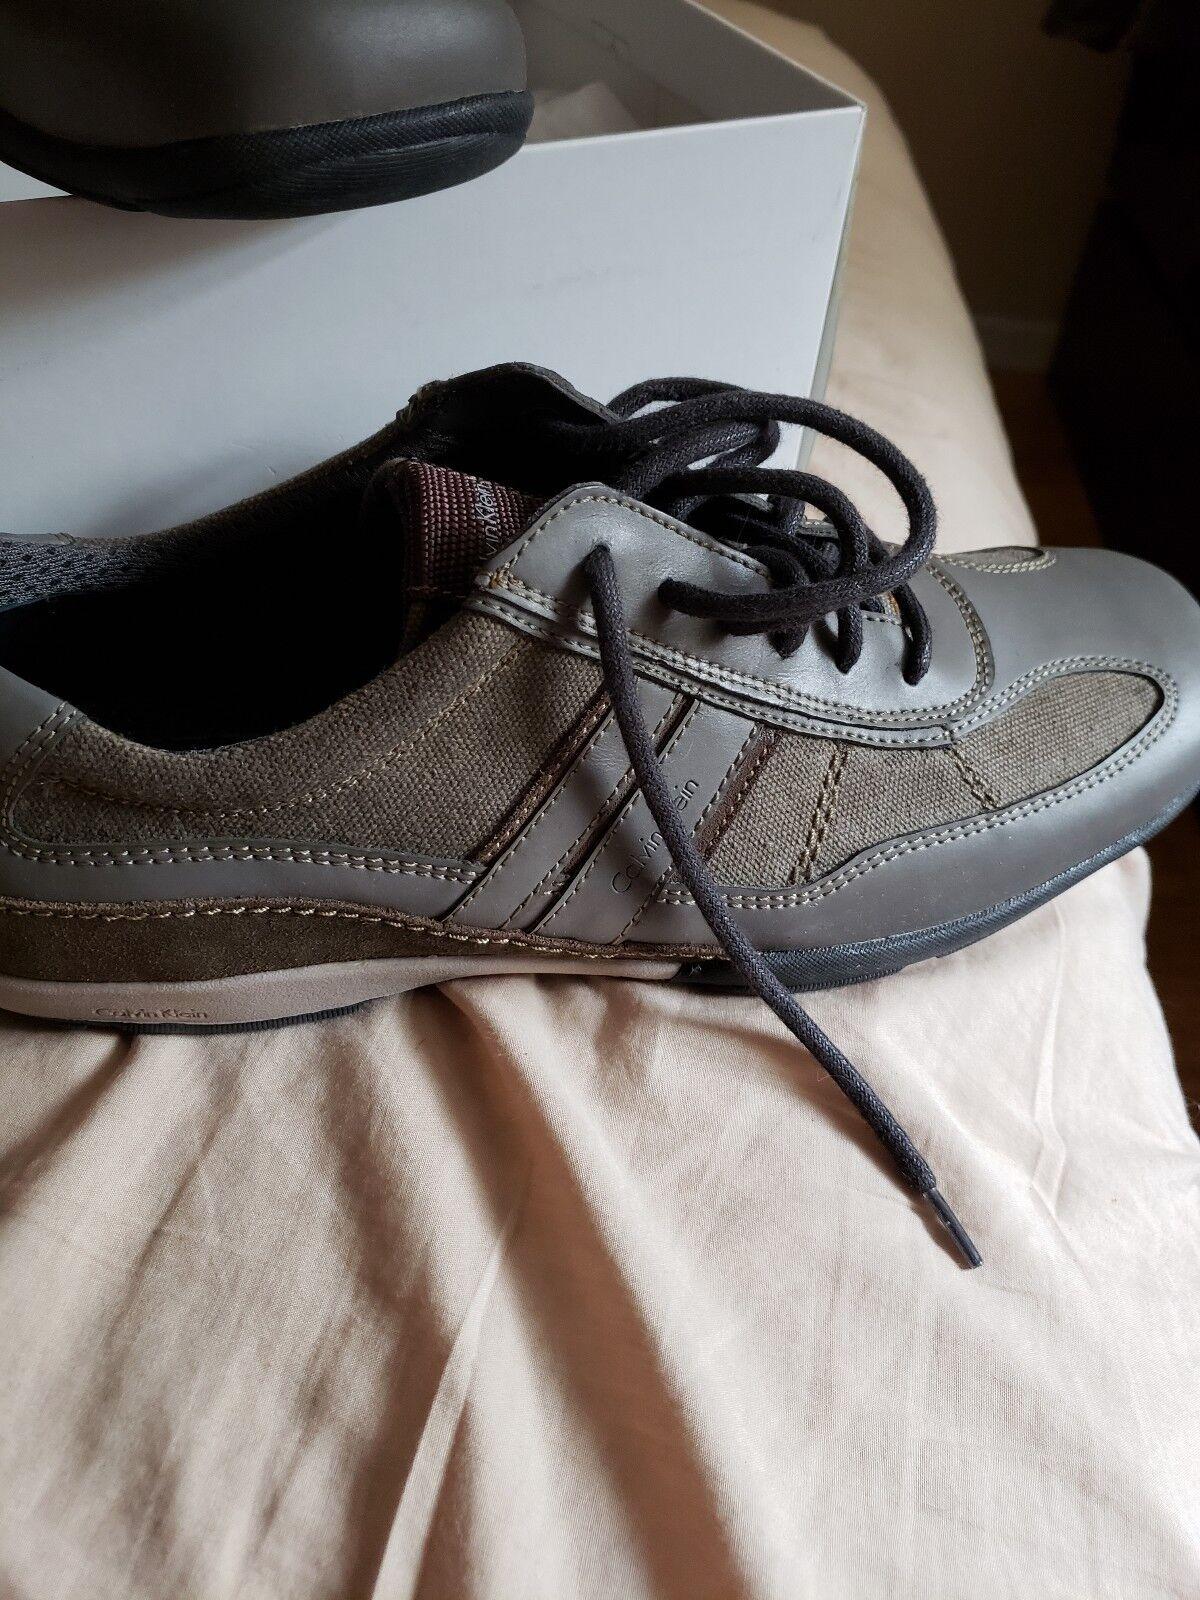 Calvin Klein 10  Uomo Casual Sneakers Größe 10 Klein New With Box 09651b